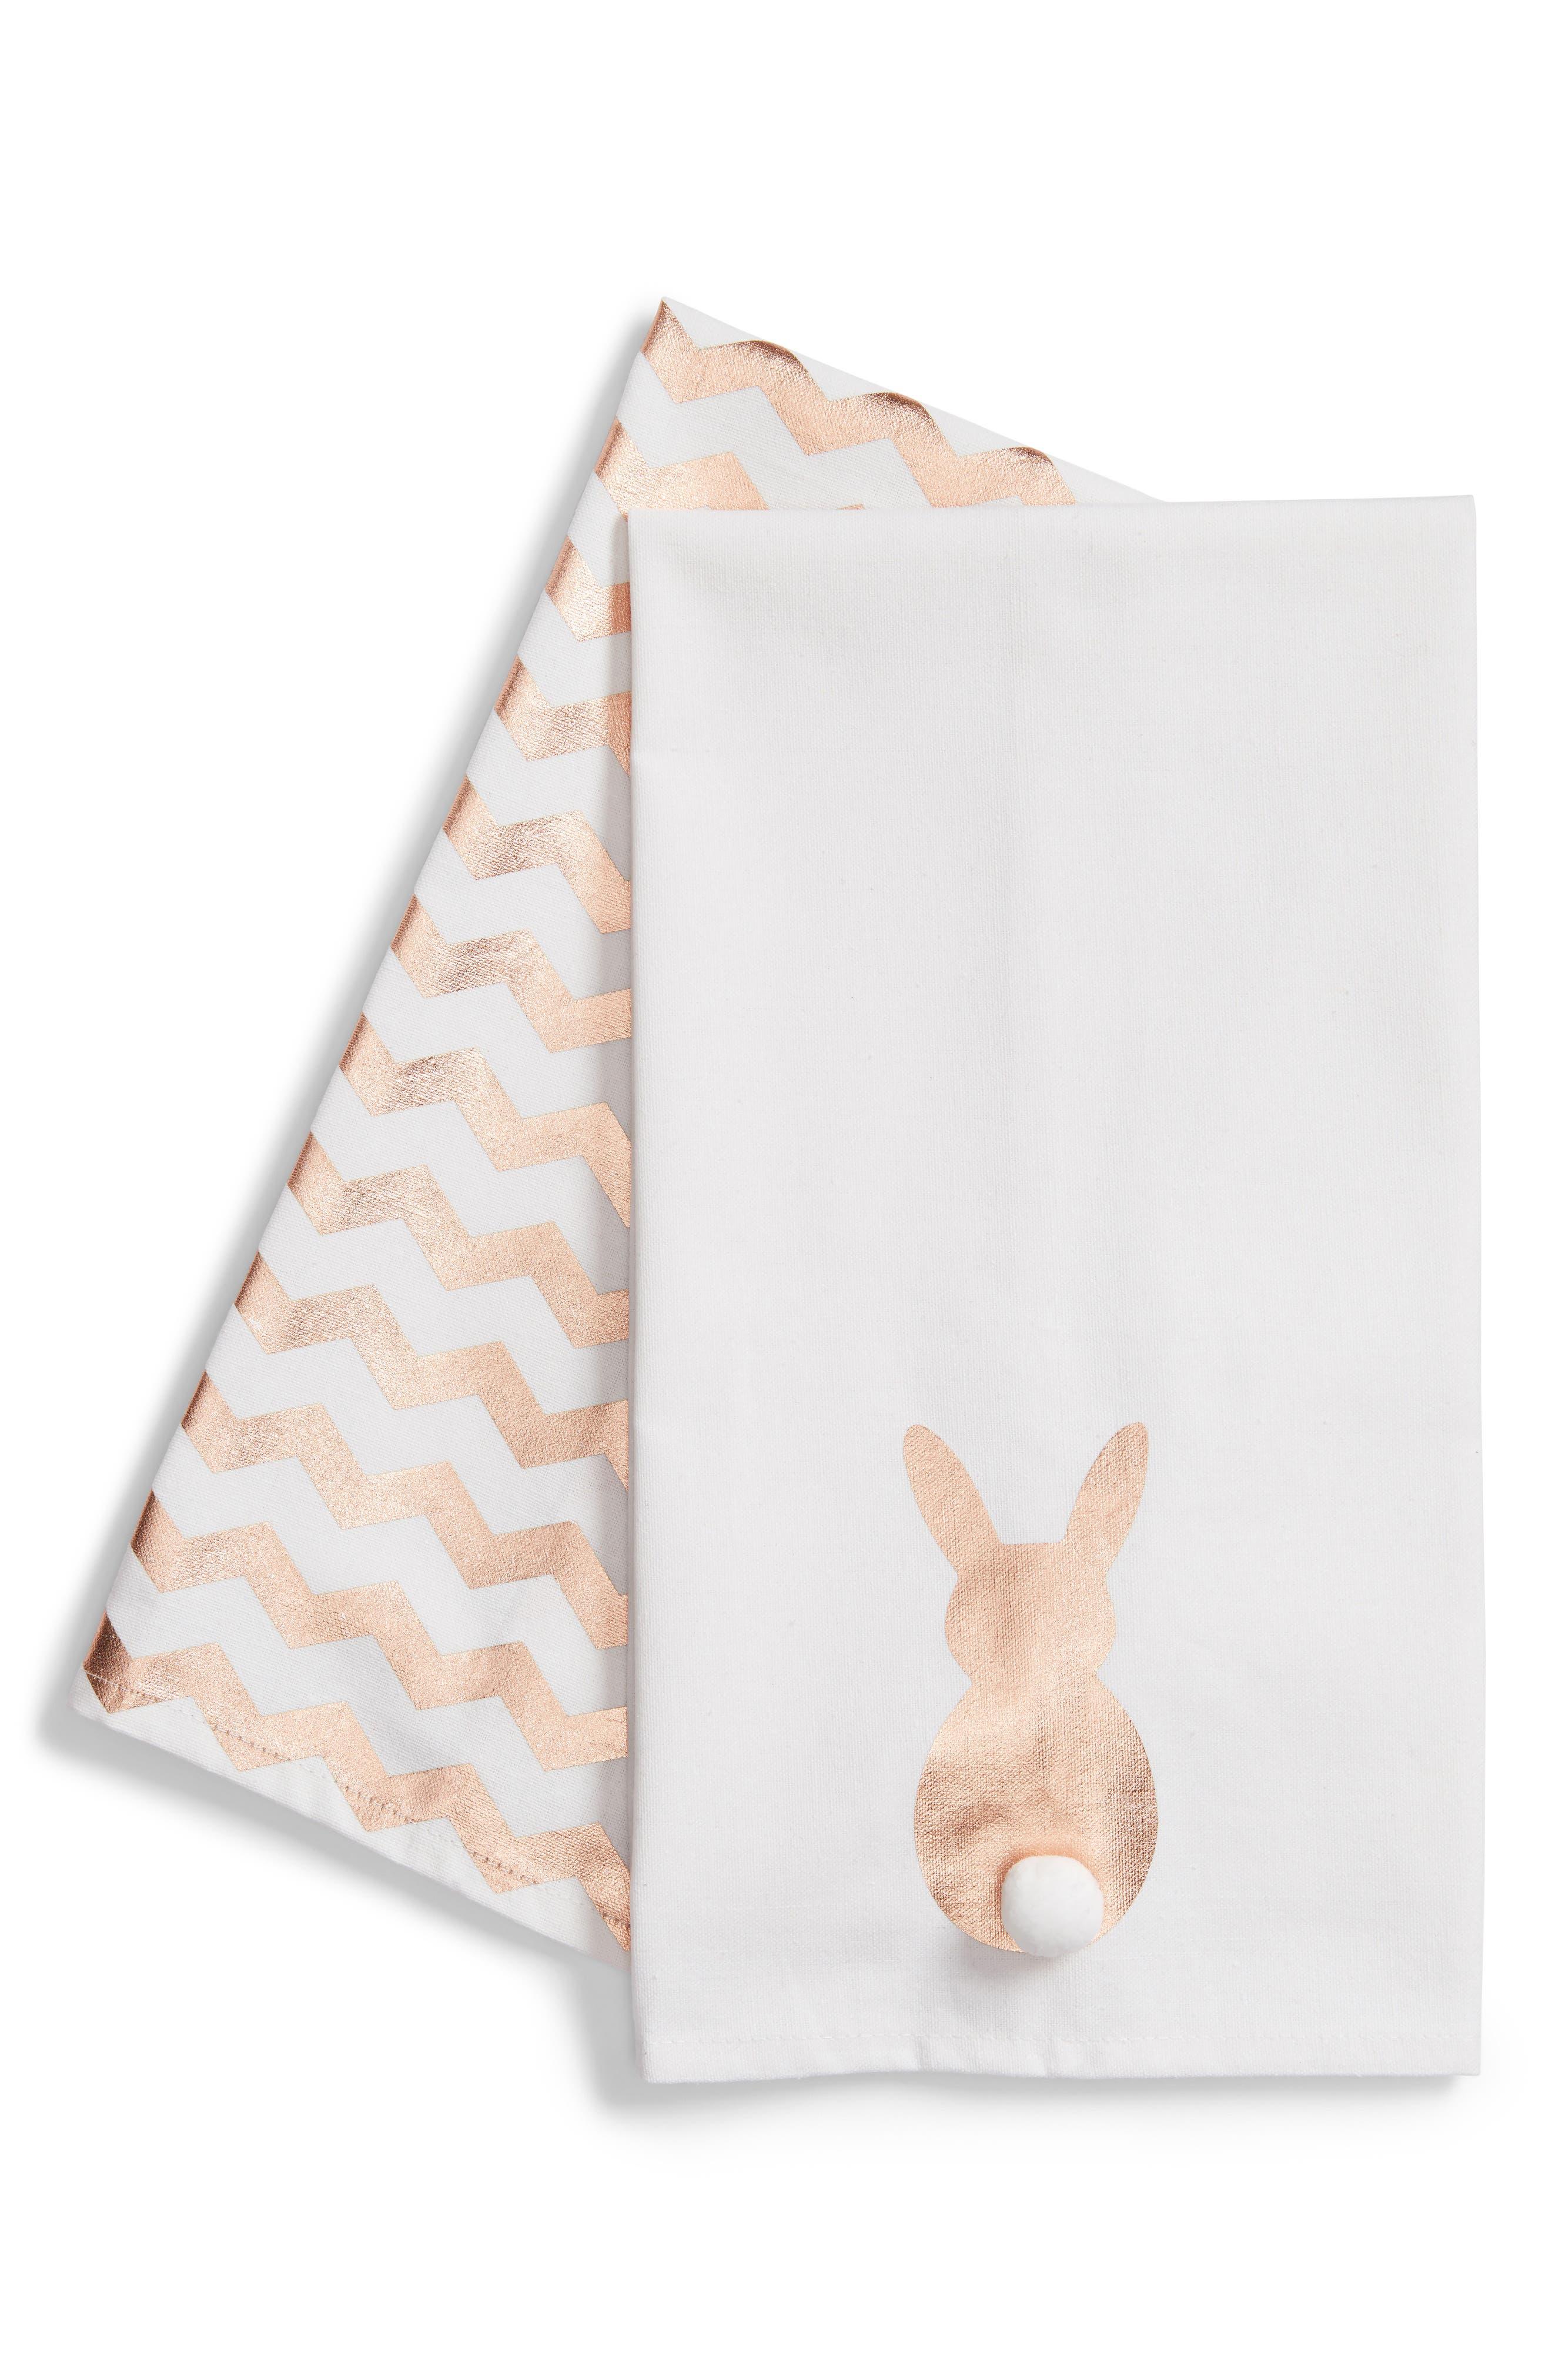 Bunny Set of 2 Dishtowels,                         Main,                         color, Gold